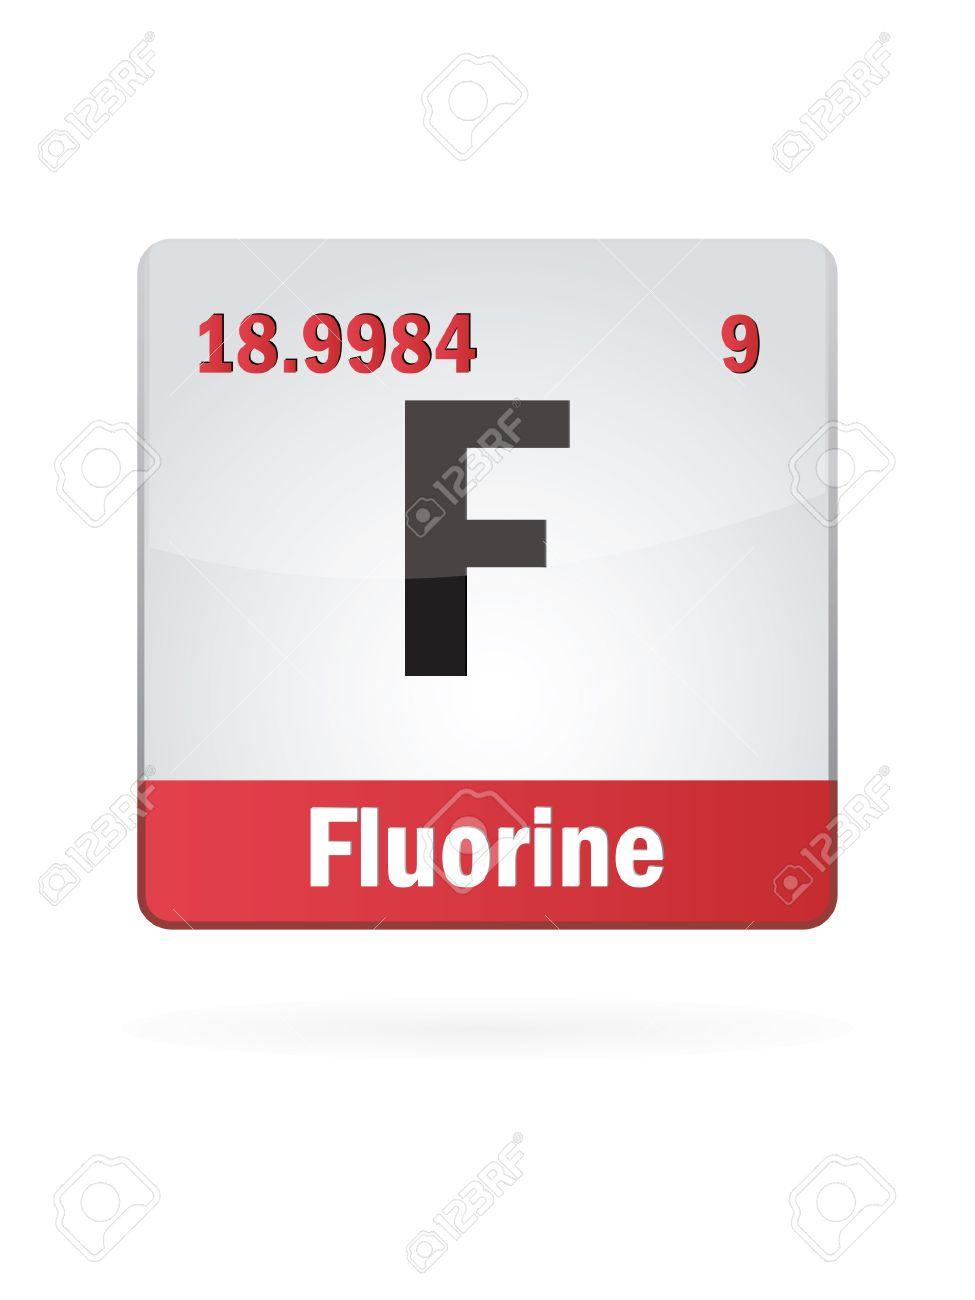 Fluorine symbol periodic table gallery periodic table images fluorine periodic table images periodic table images fluorine symbol illustration icon royalty free cliparts vectors fluorine gamestrikefo Gallery